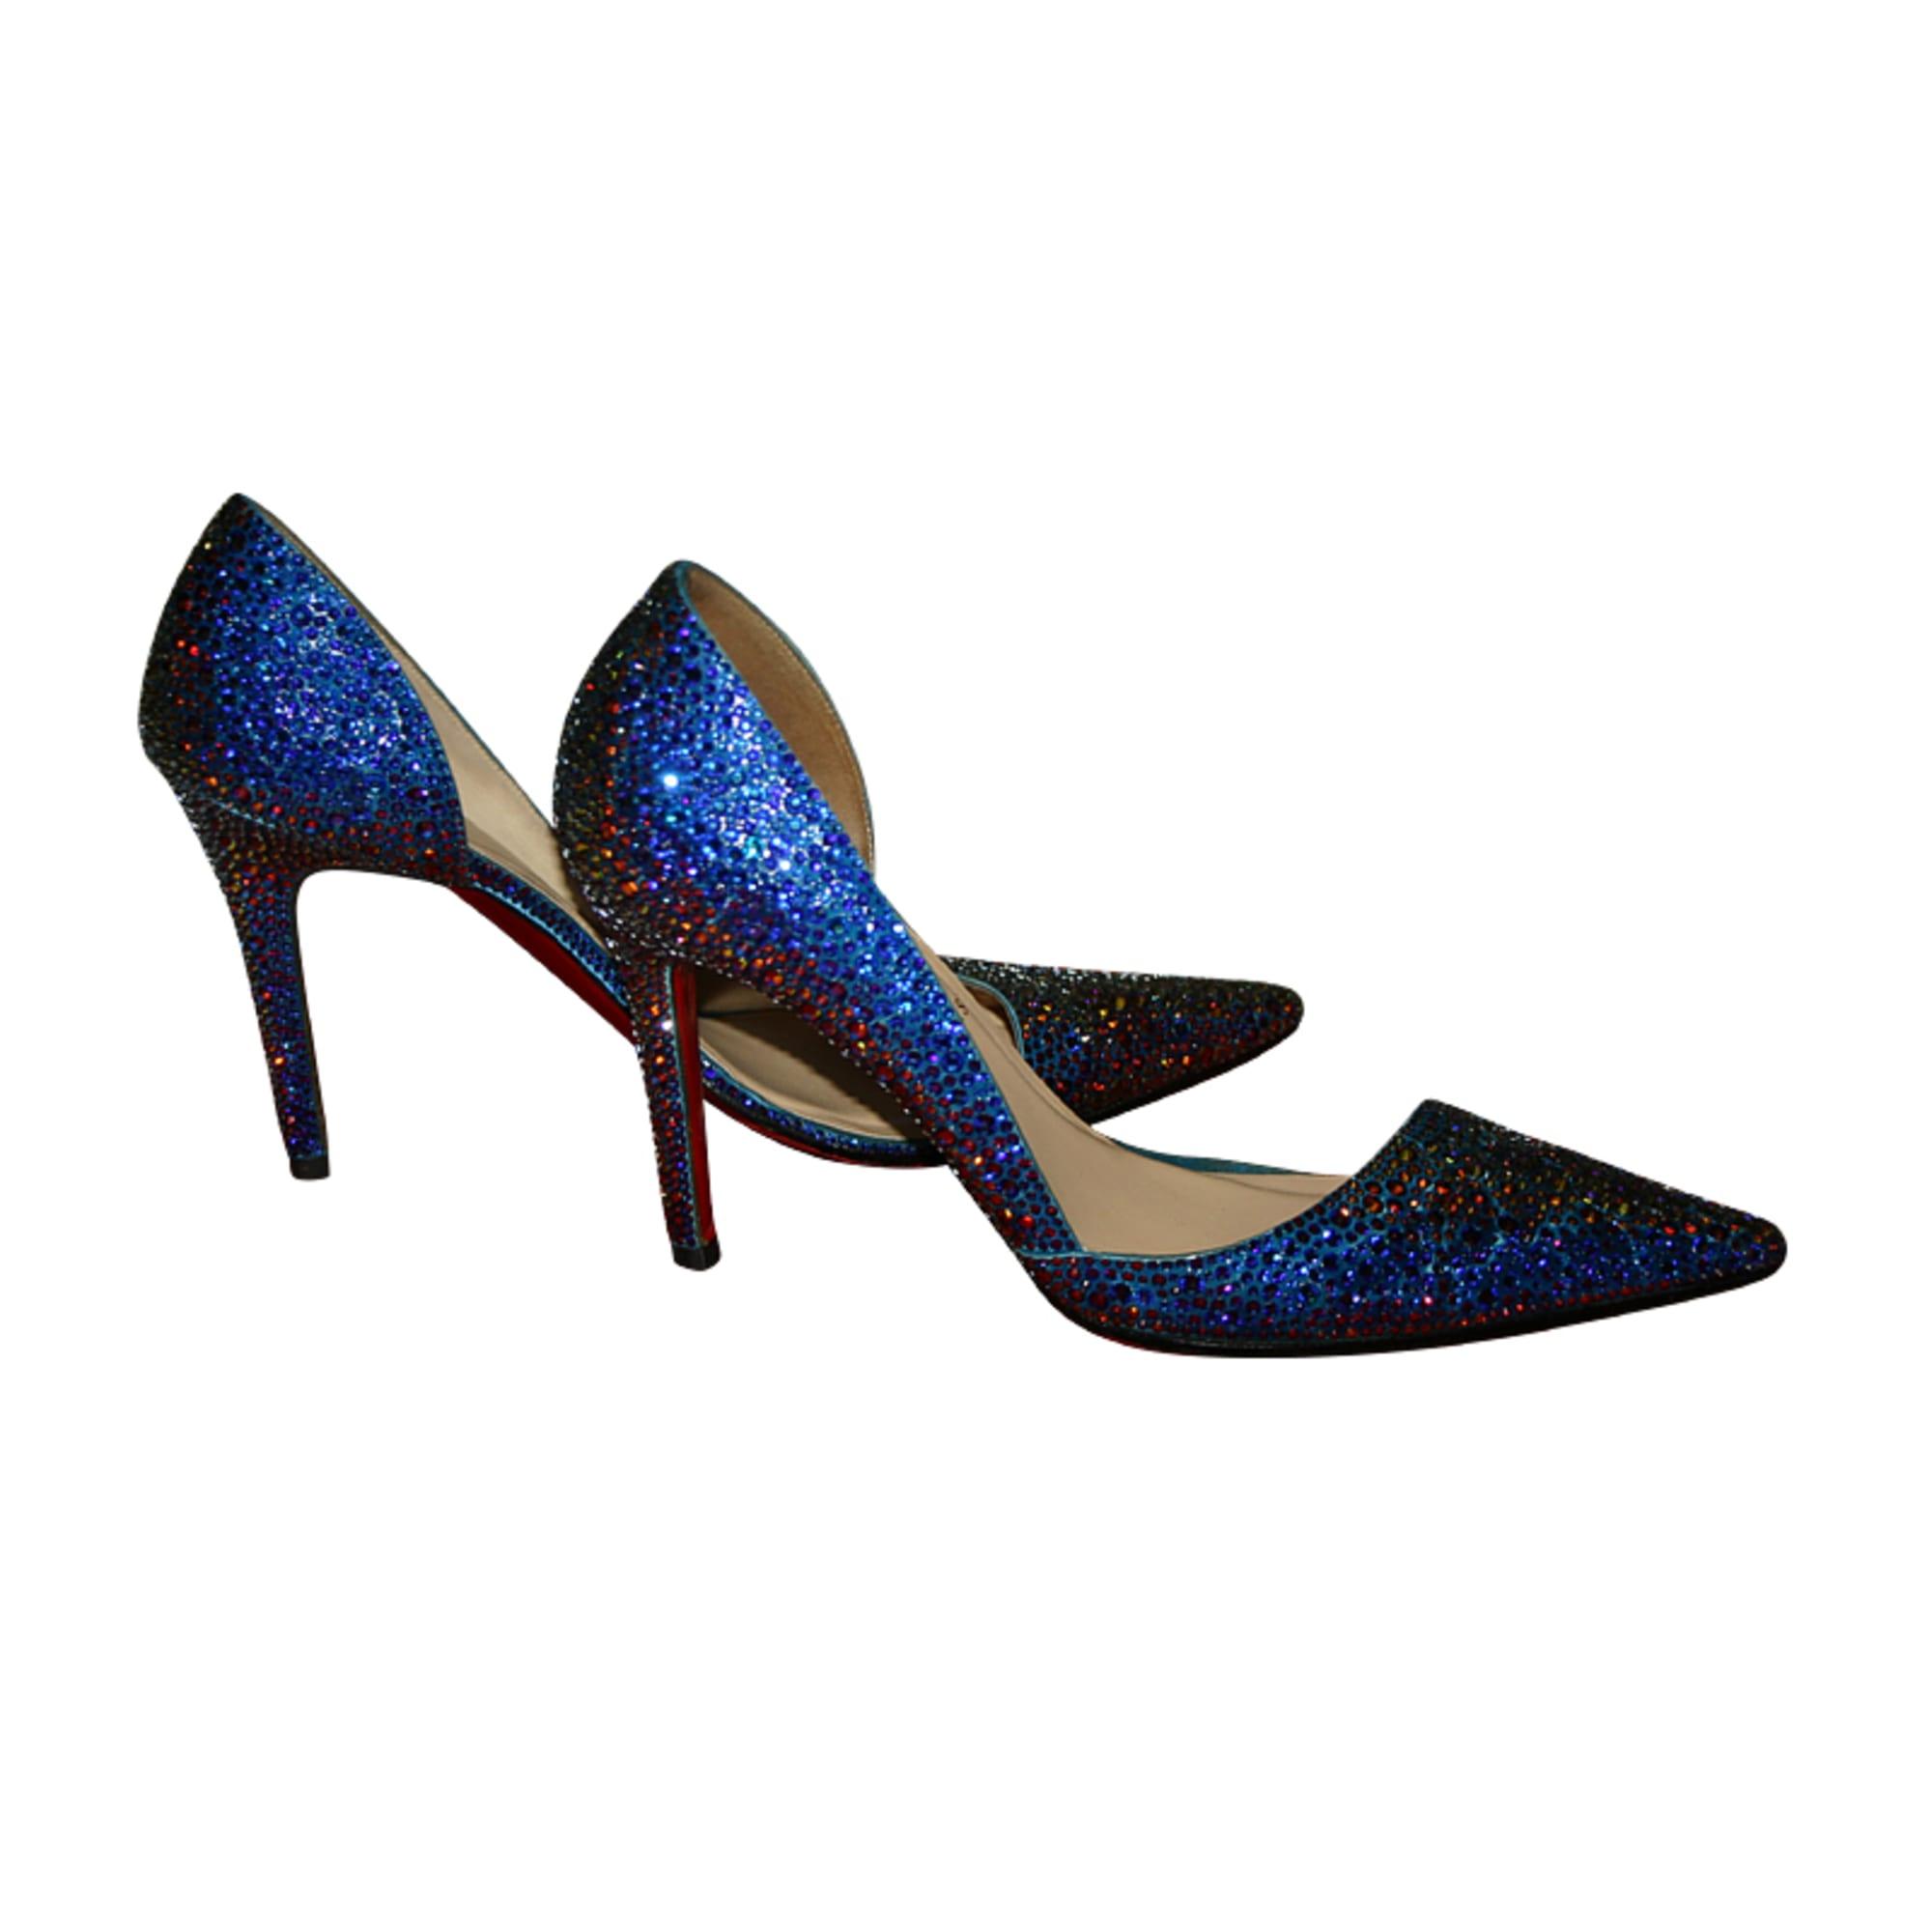 Escarpins CHRISTIAN LOUBOUTIN 37,5 bleu vendu par Clémanon52256 - 514935 ef592d8e3f0a